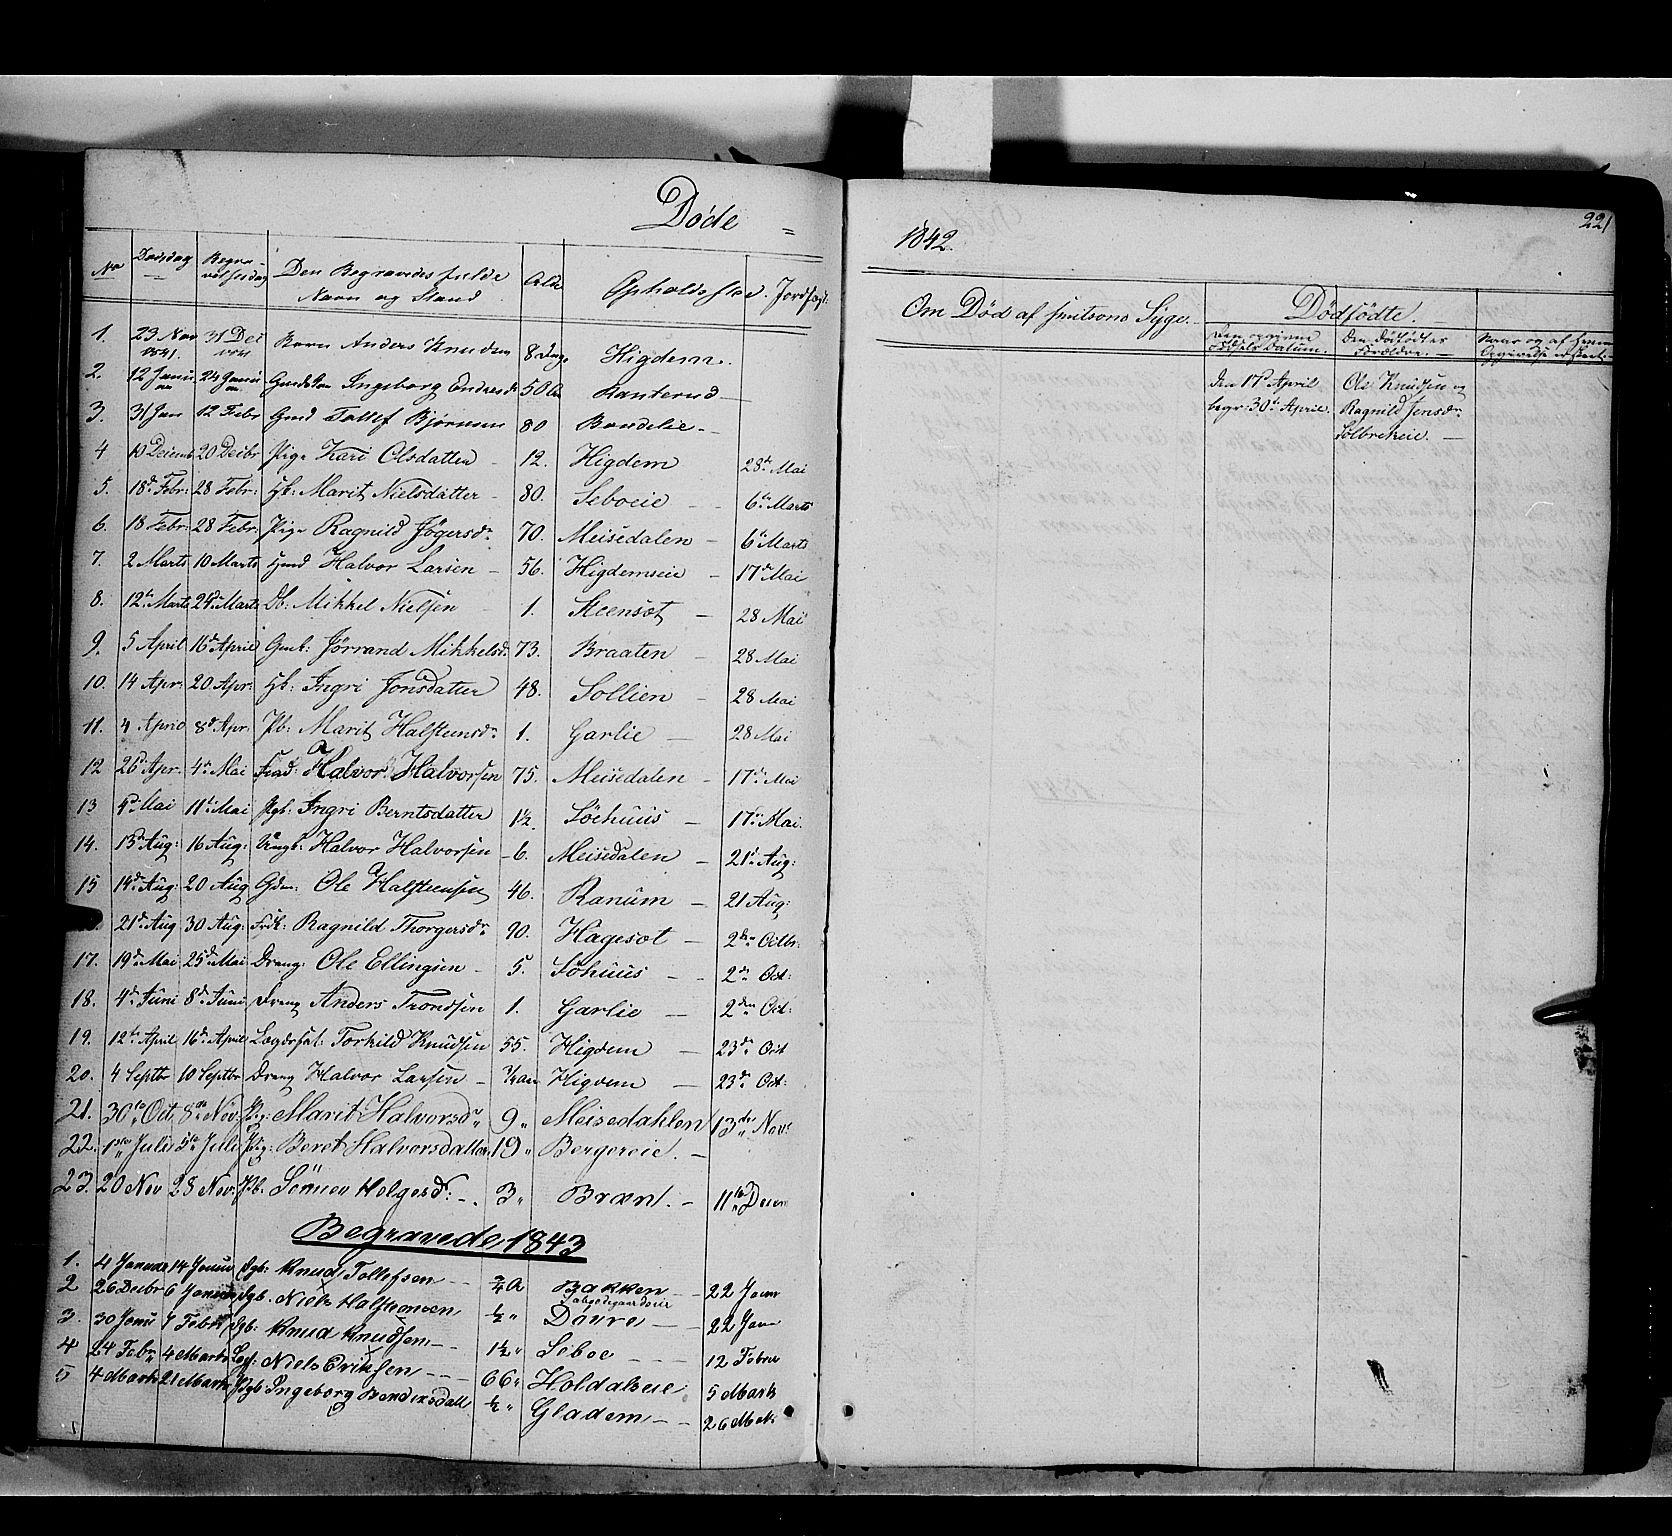 SAH, Nord-Aurdal prestekontor, Ministerialbok nr. 7, 1842-1863, s. 221